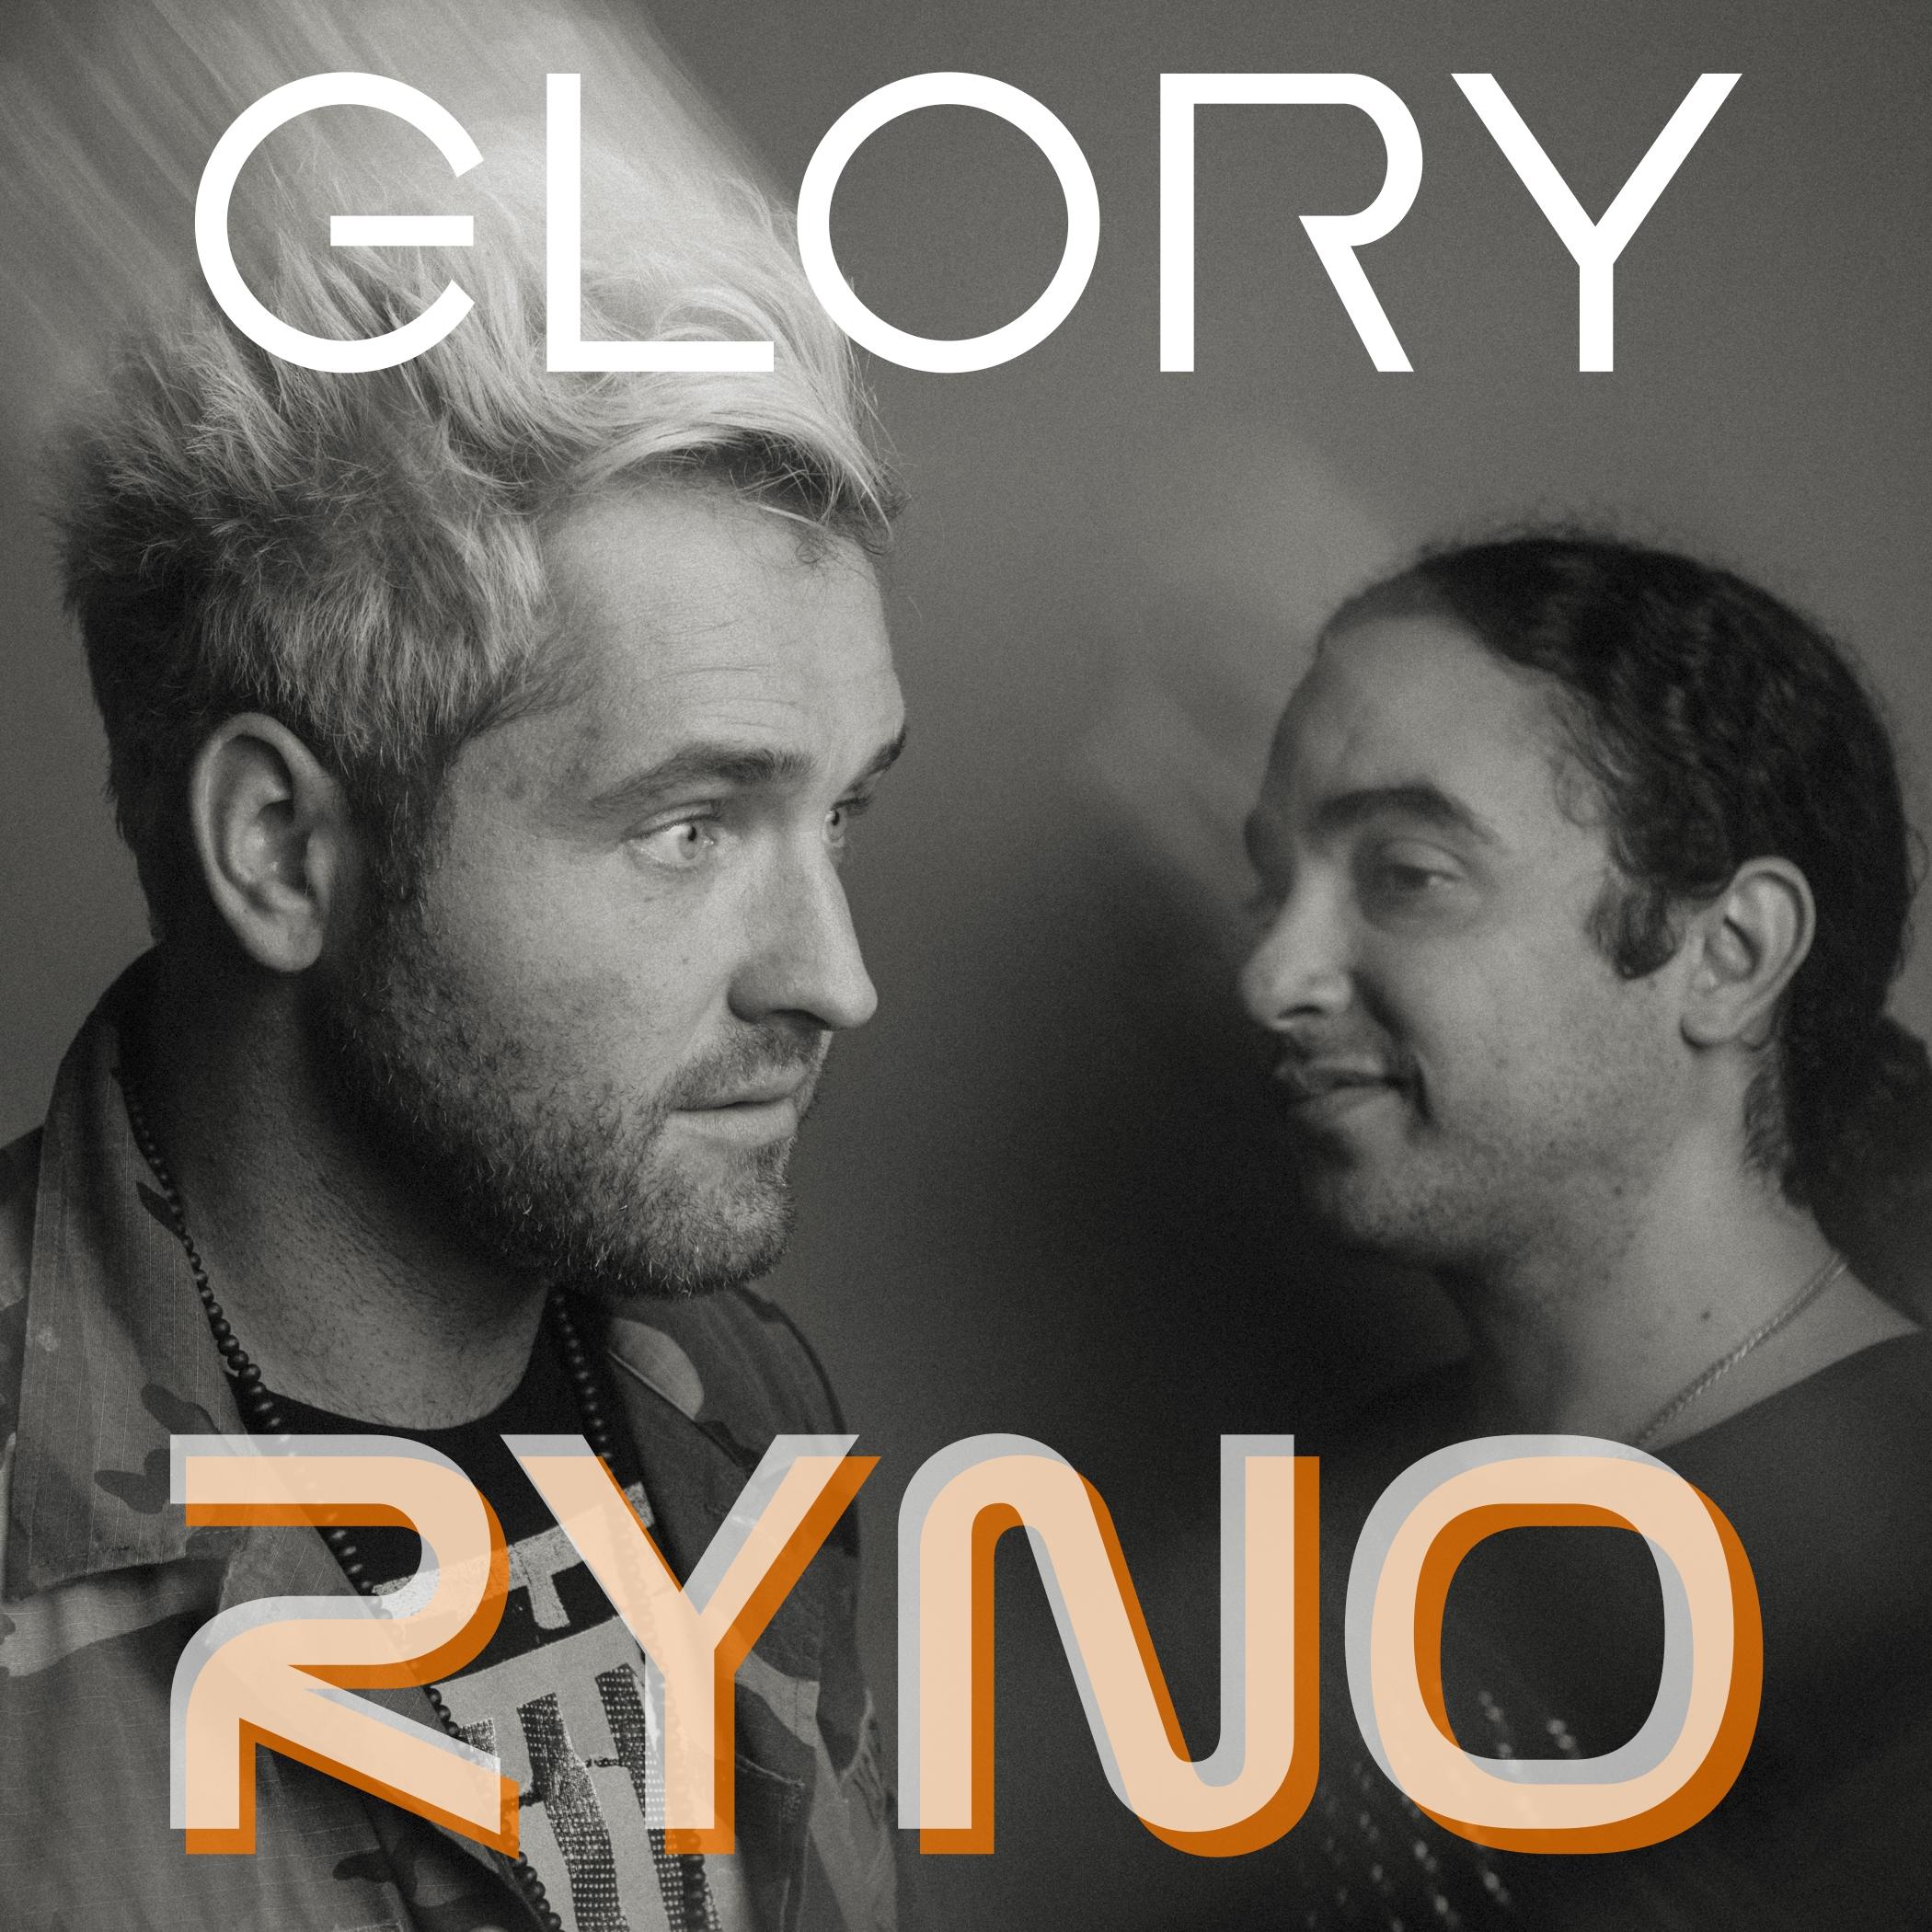 RYNO_GloryART_FINAL3.jpg